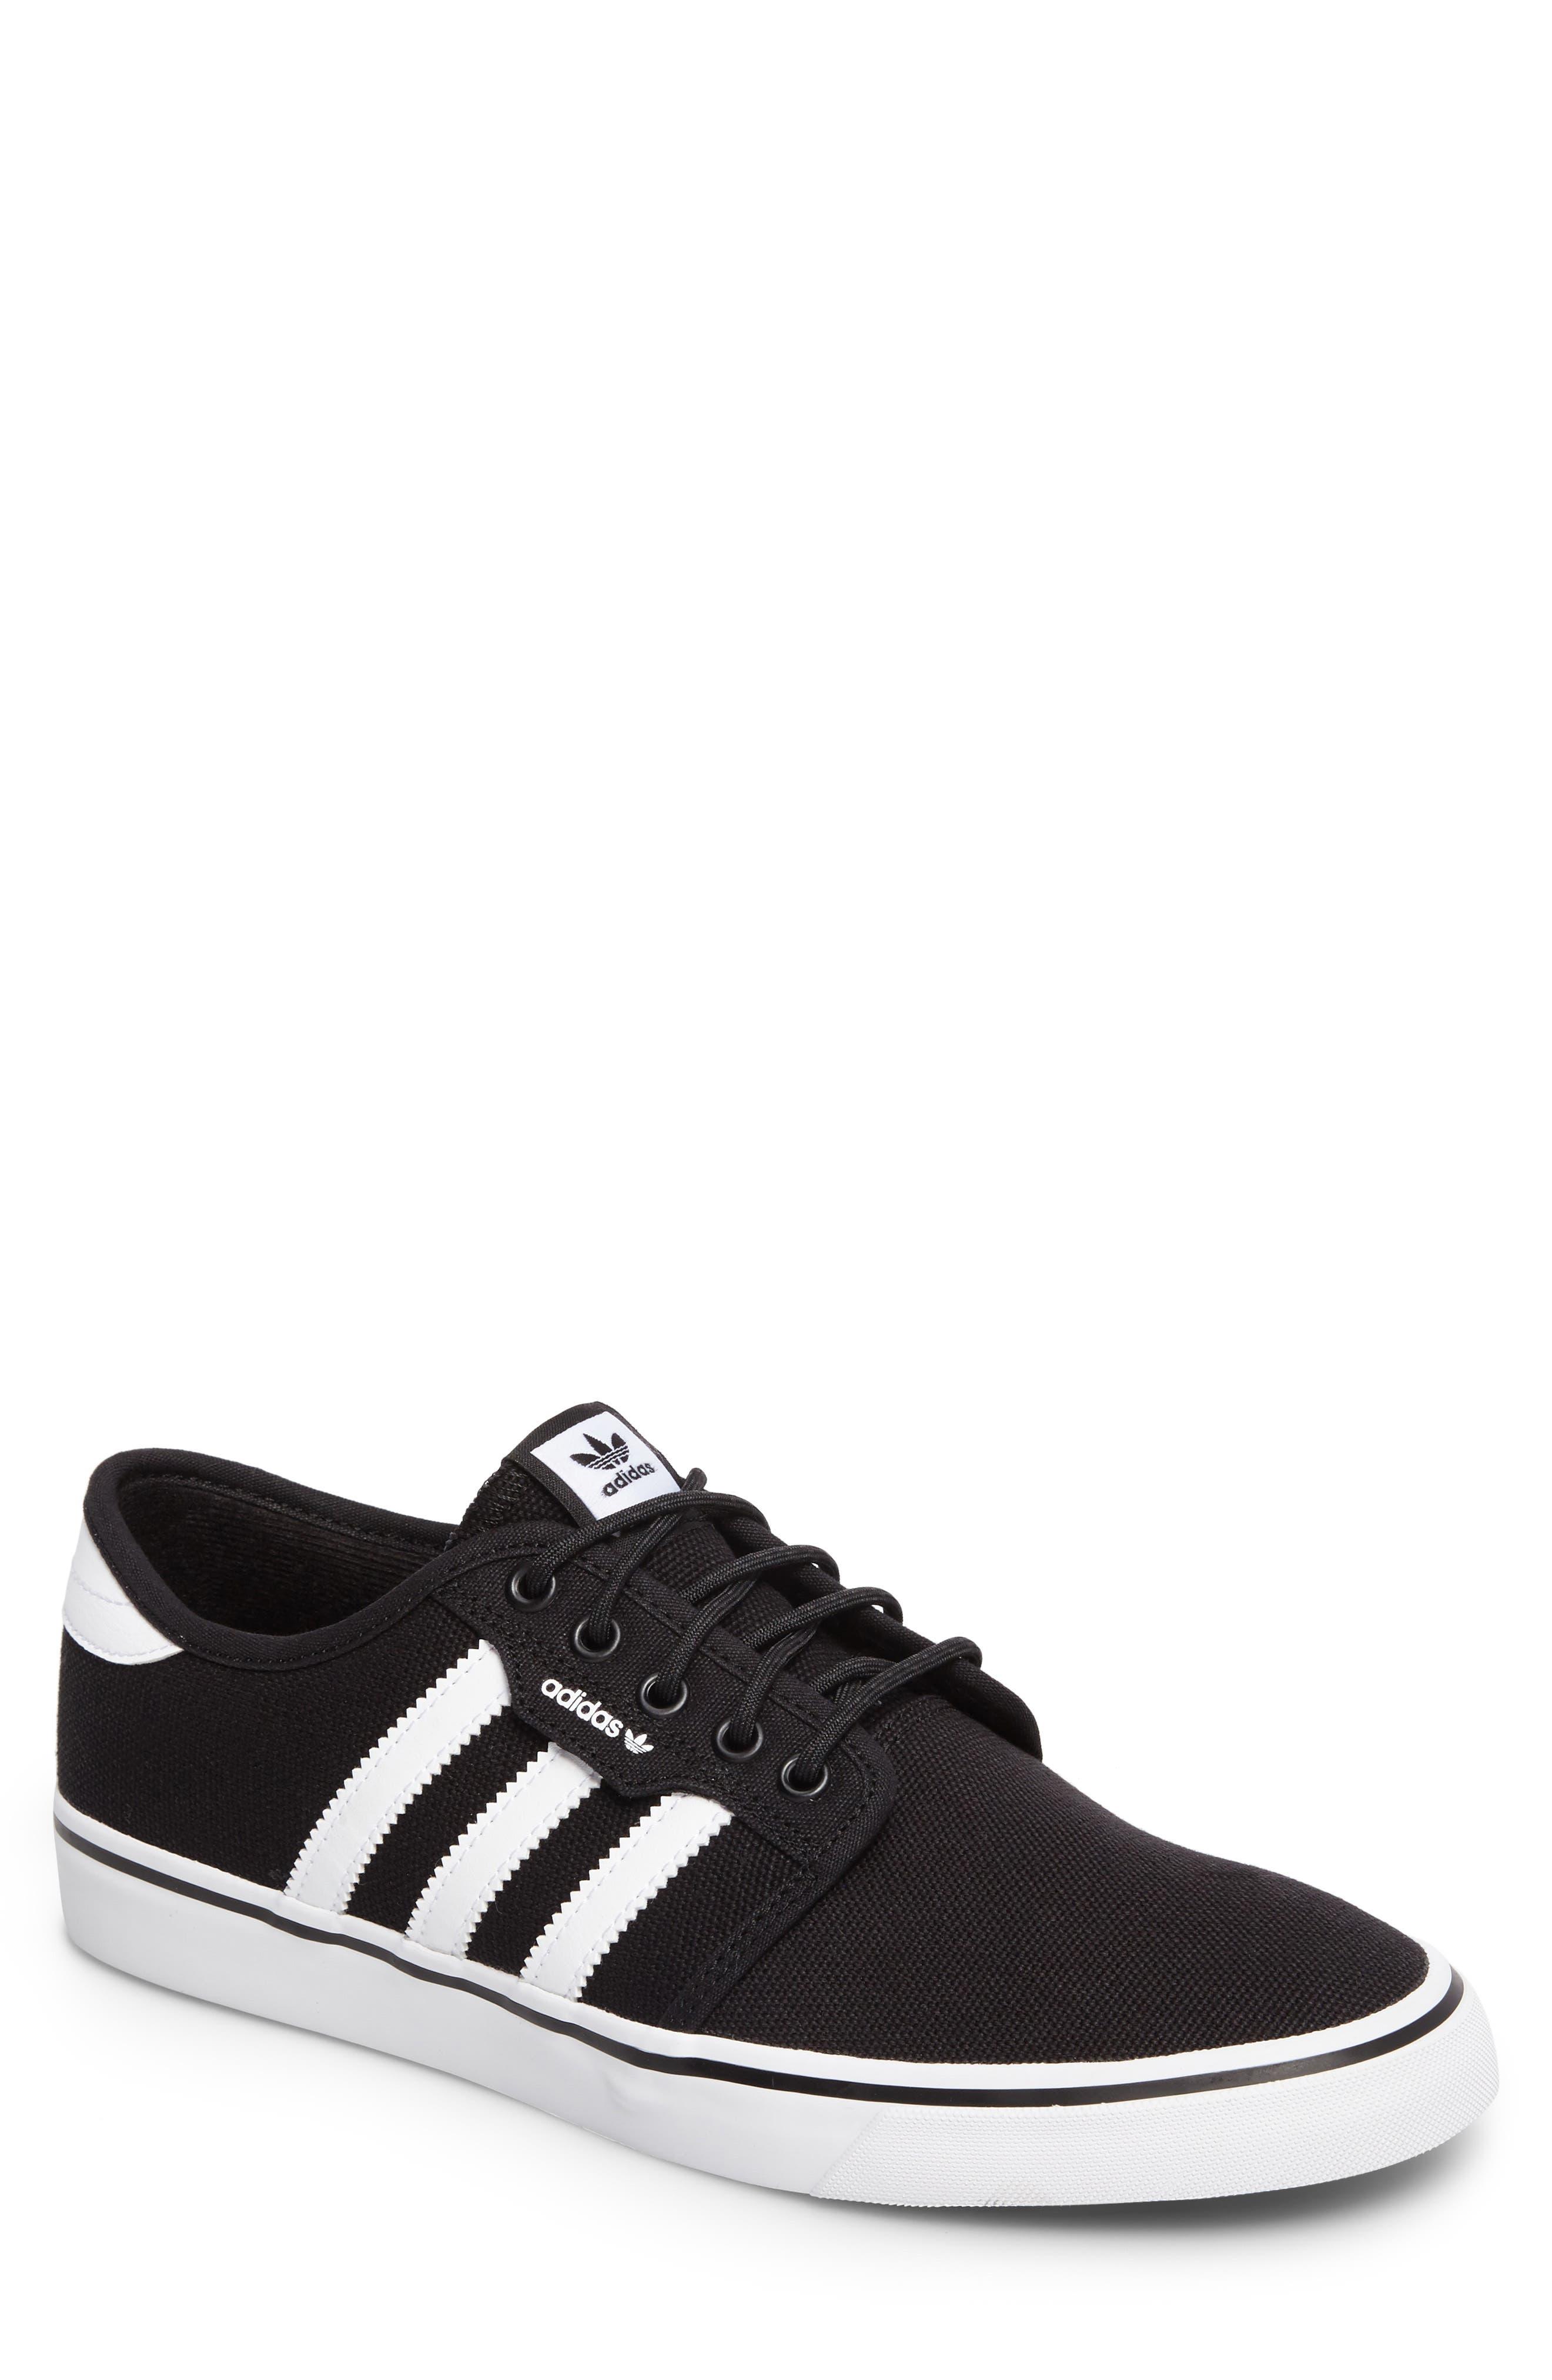 'Seeley' Skate Sneaker,                             Main thumbnail 1, color,                             009